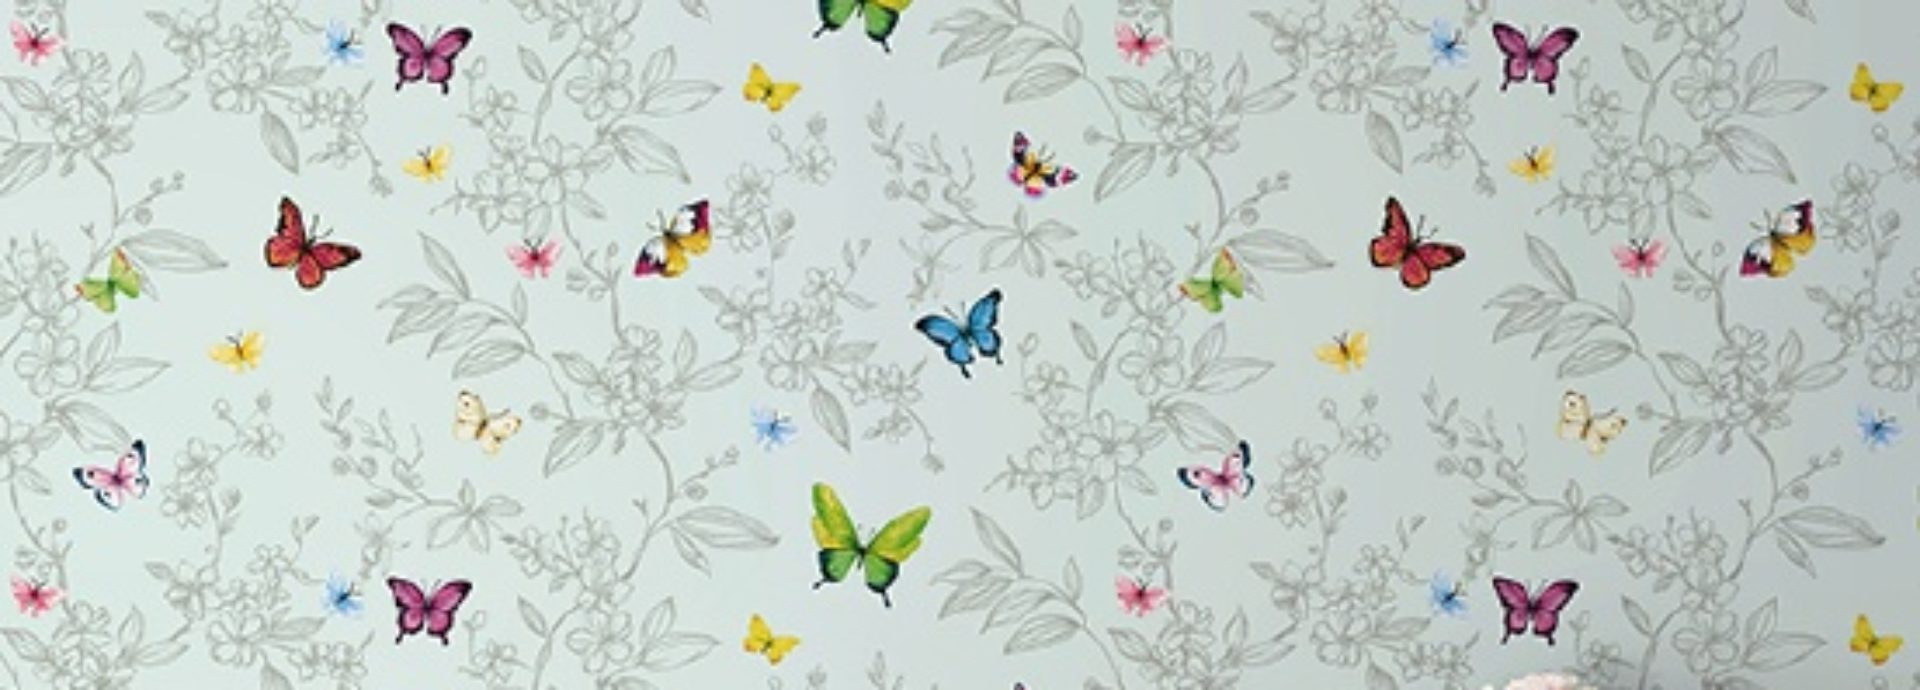 nature wallpaper for walls dealer in delhi-gurgaon |